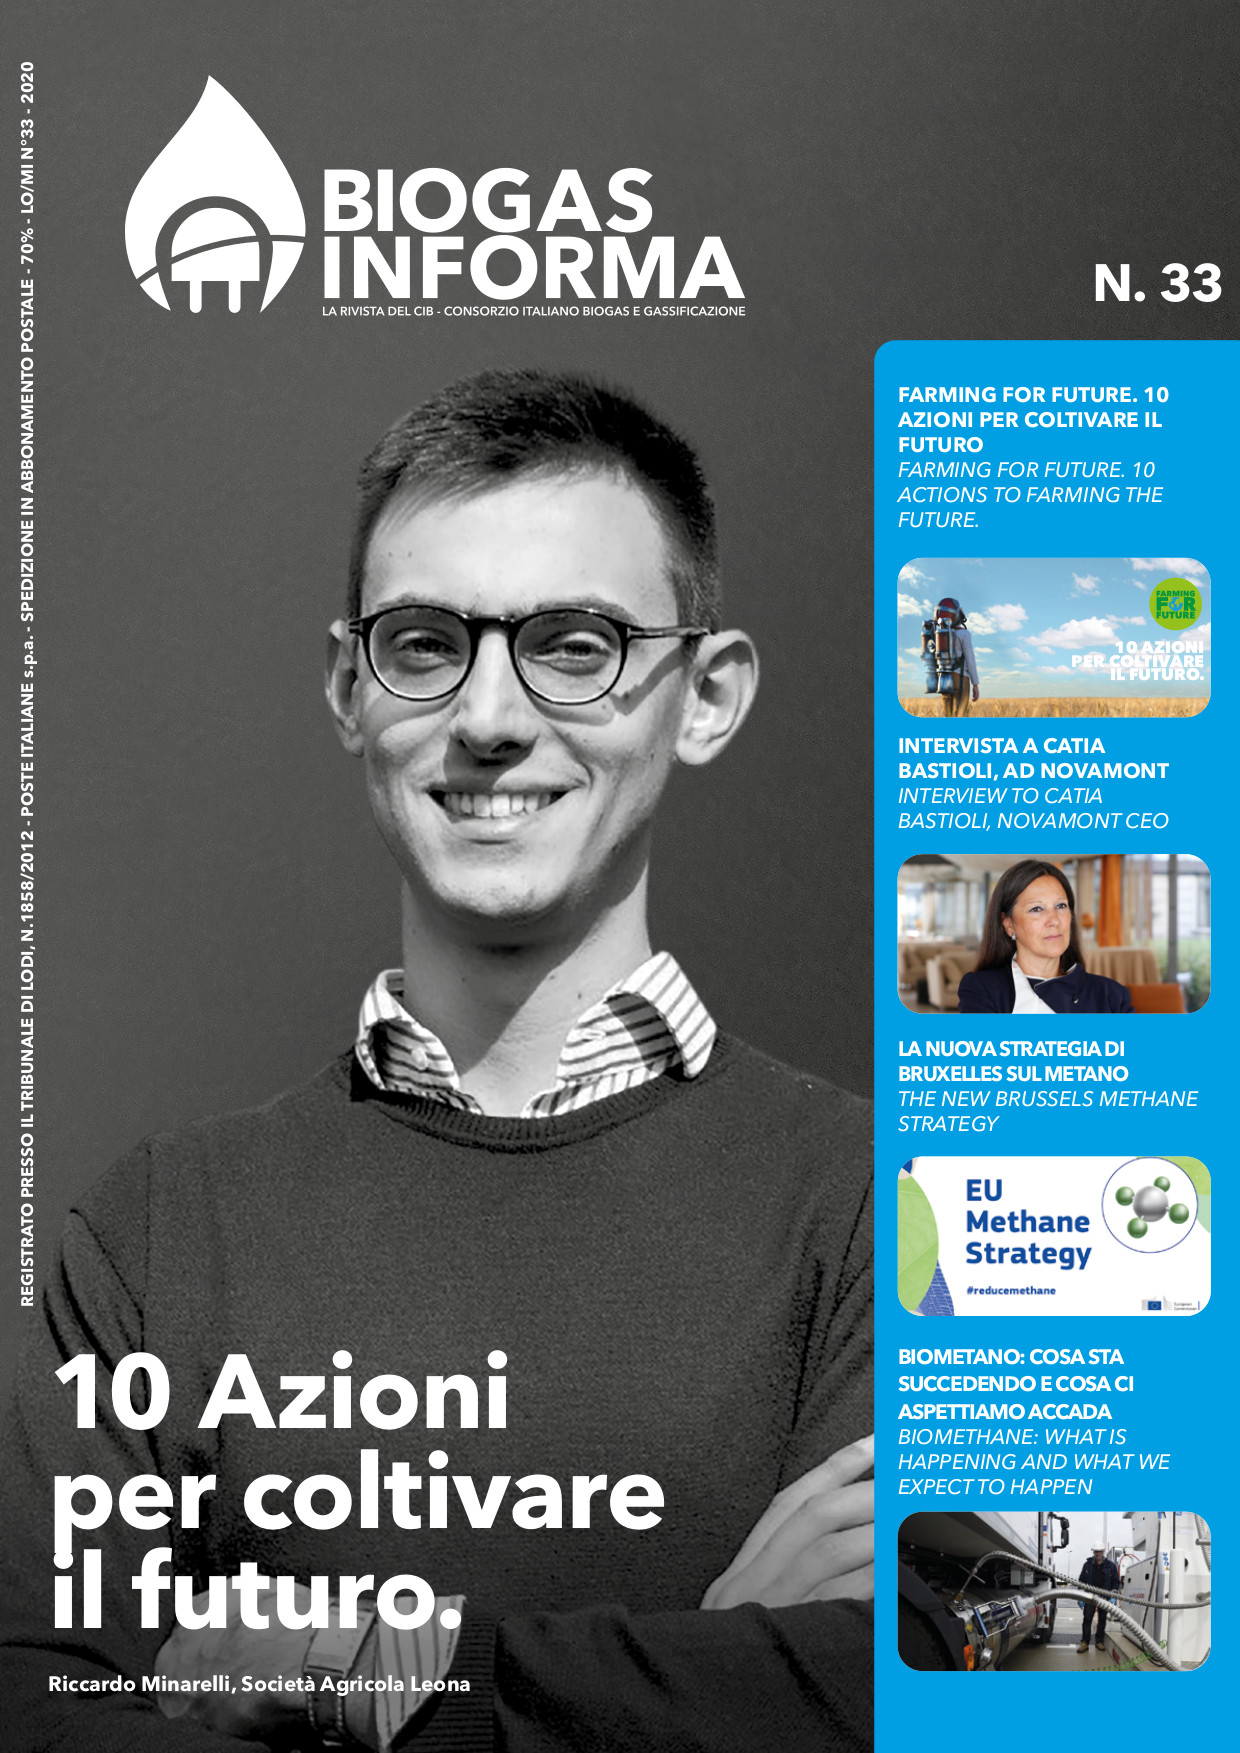 COPERTINA_BIOGAS_INFORMA_N33